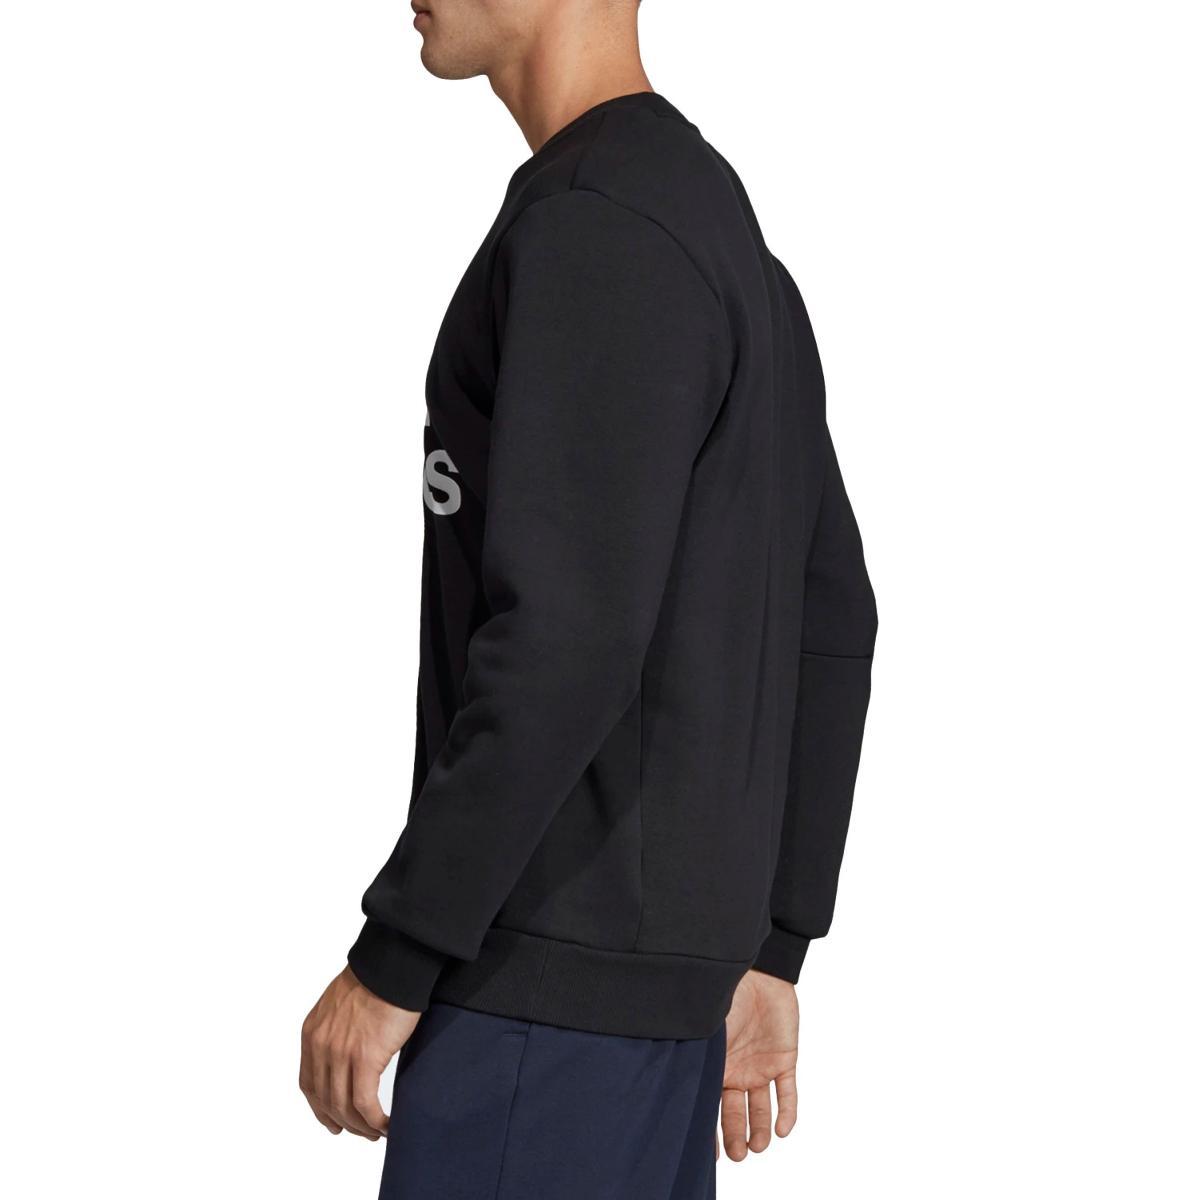 Felpa Adidas girocollo con stampa logo Must Haves Badge of Sport da uomo rif. EB5265